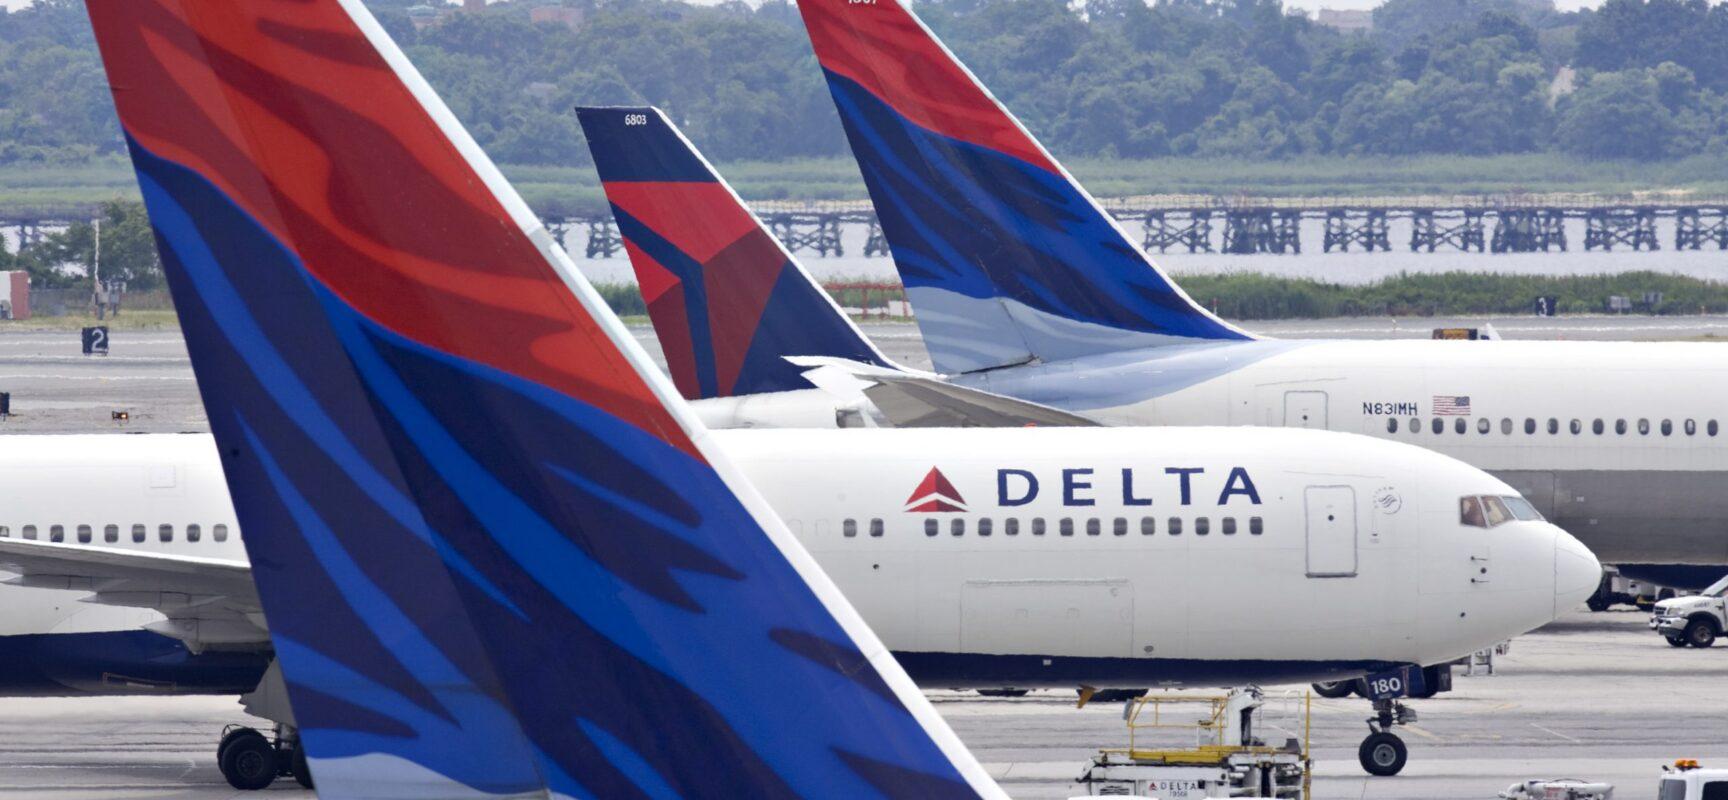 Delta espera contratar 1,5 mil comissários de bordo para 2021/2022